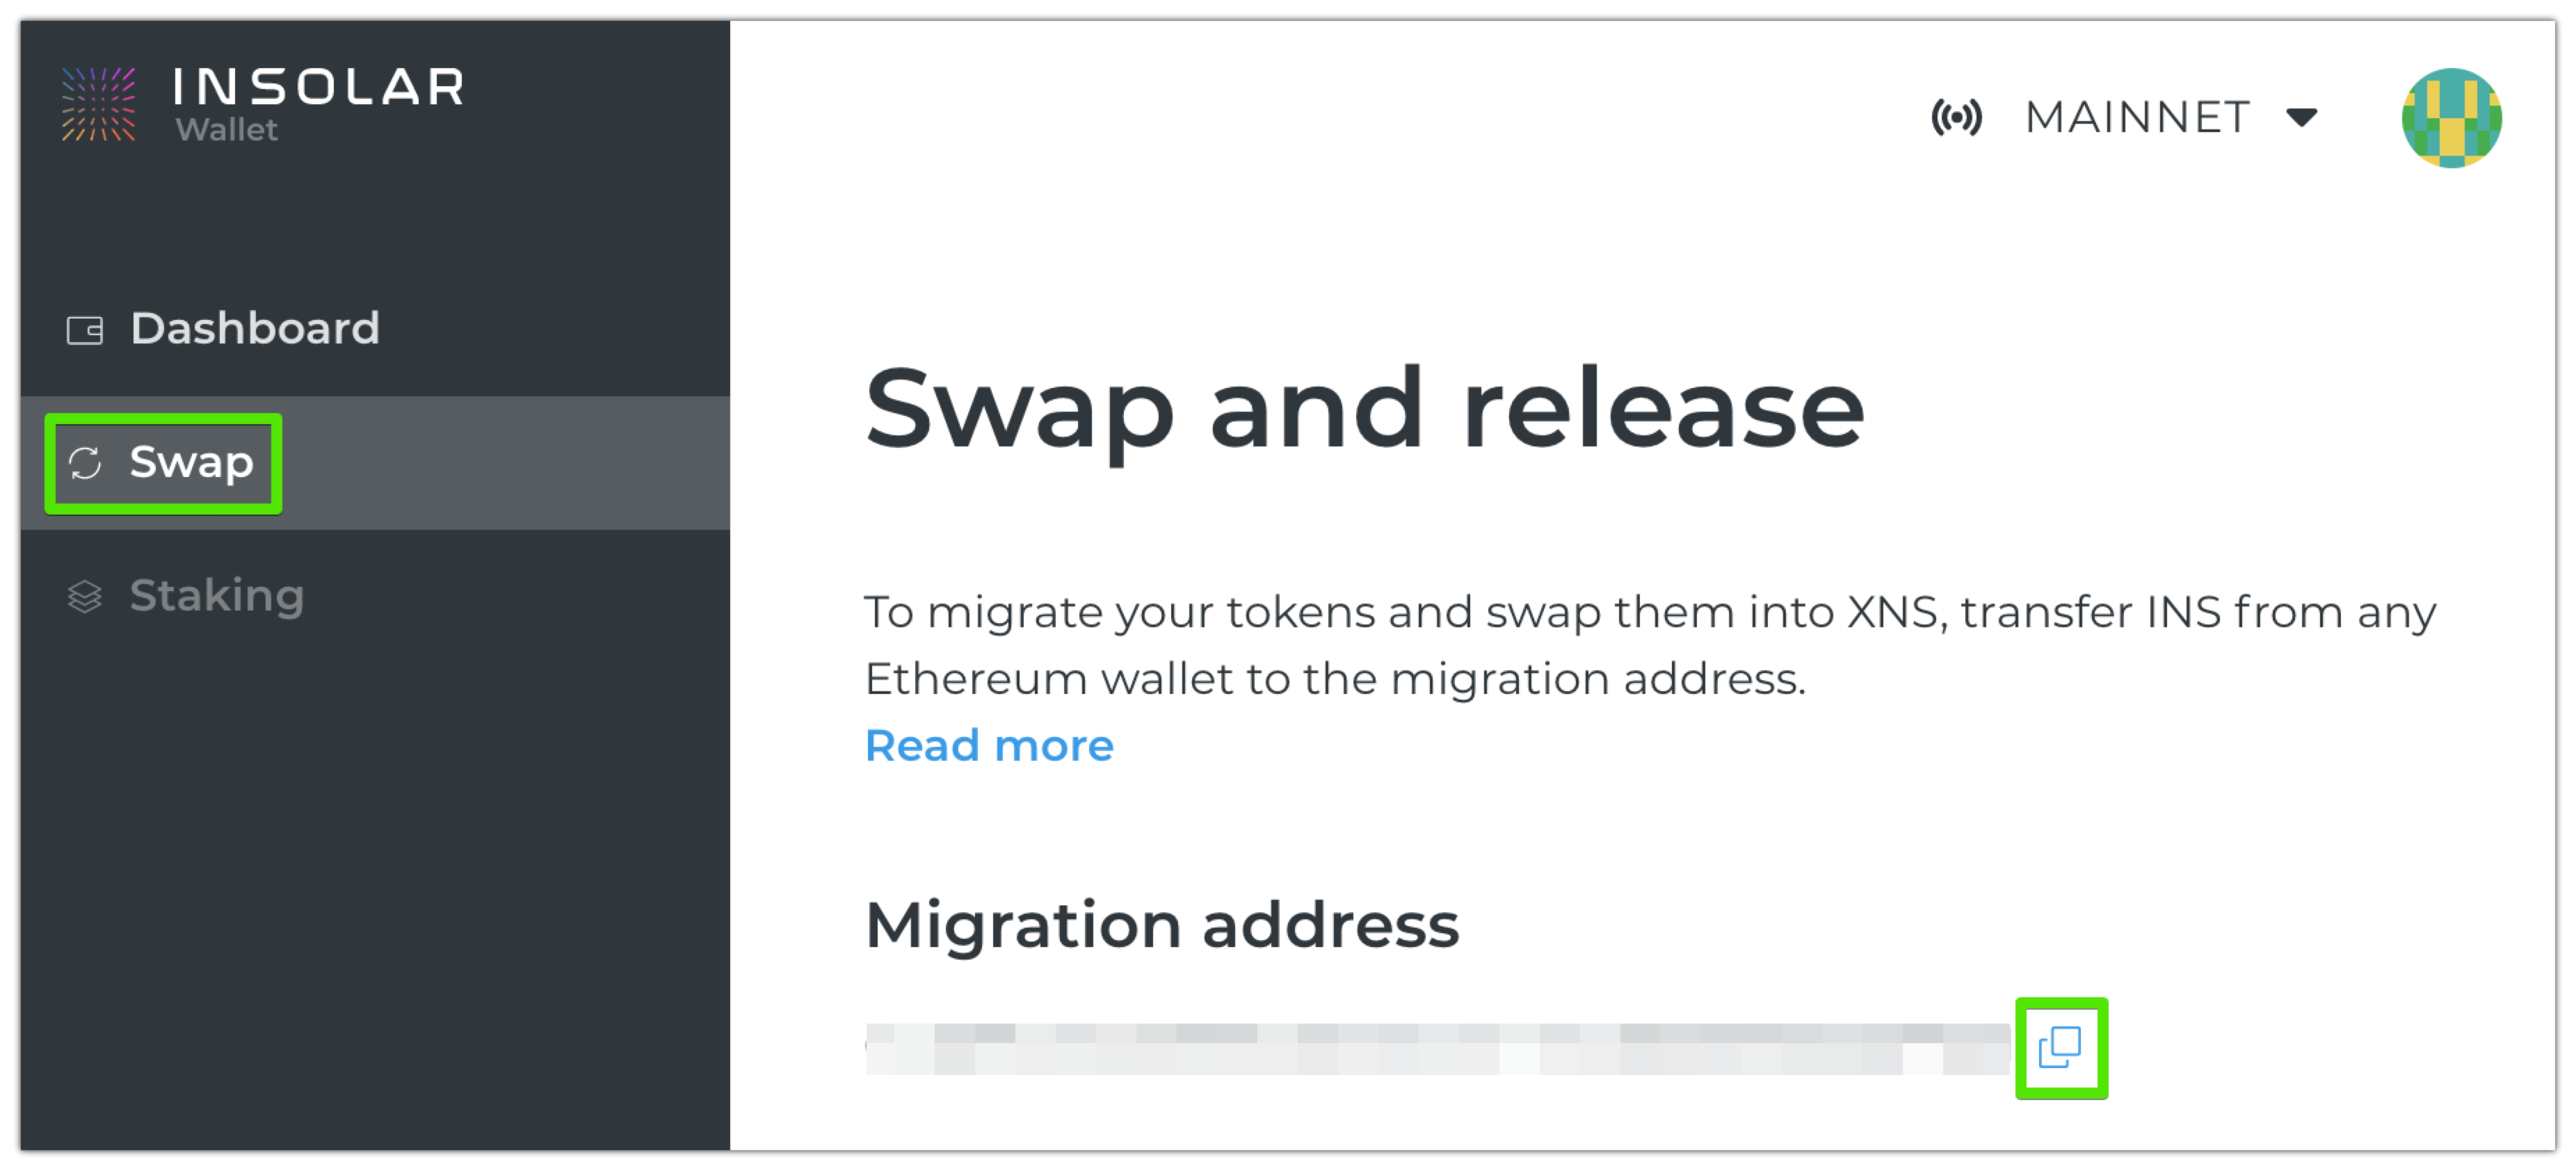 https://github.com/insolar/doc-pics/raw/master/mig-test/wlt-open-swap-tab.png